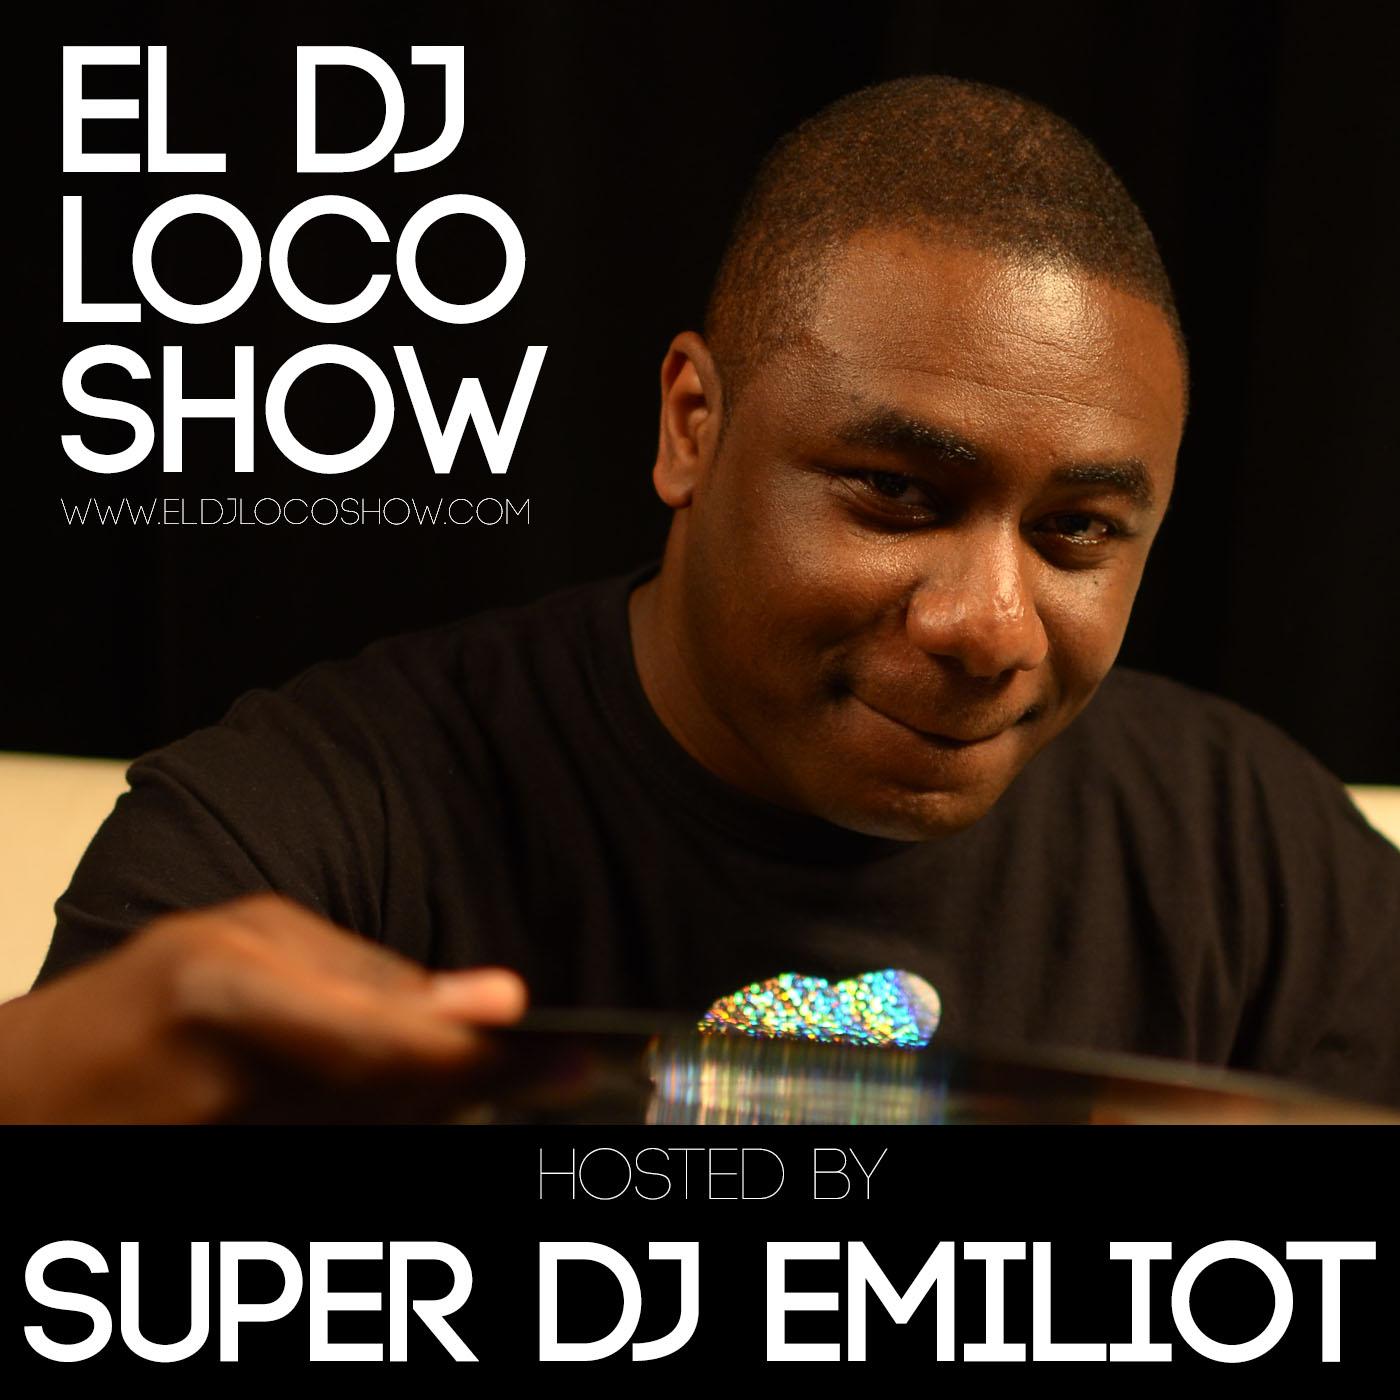 EL DJ Loco Show - Hosted by Super DJ Emiliot